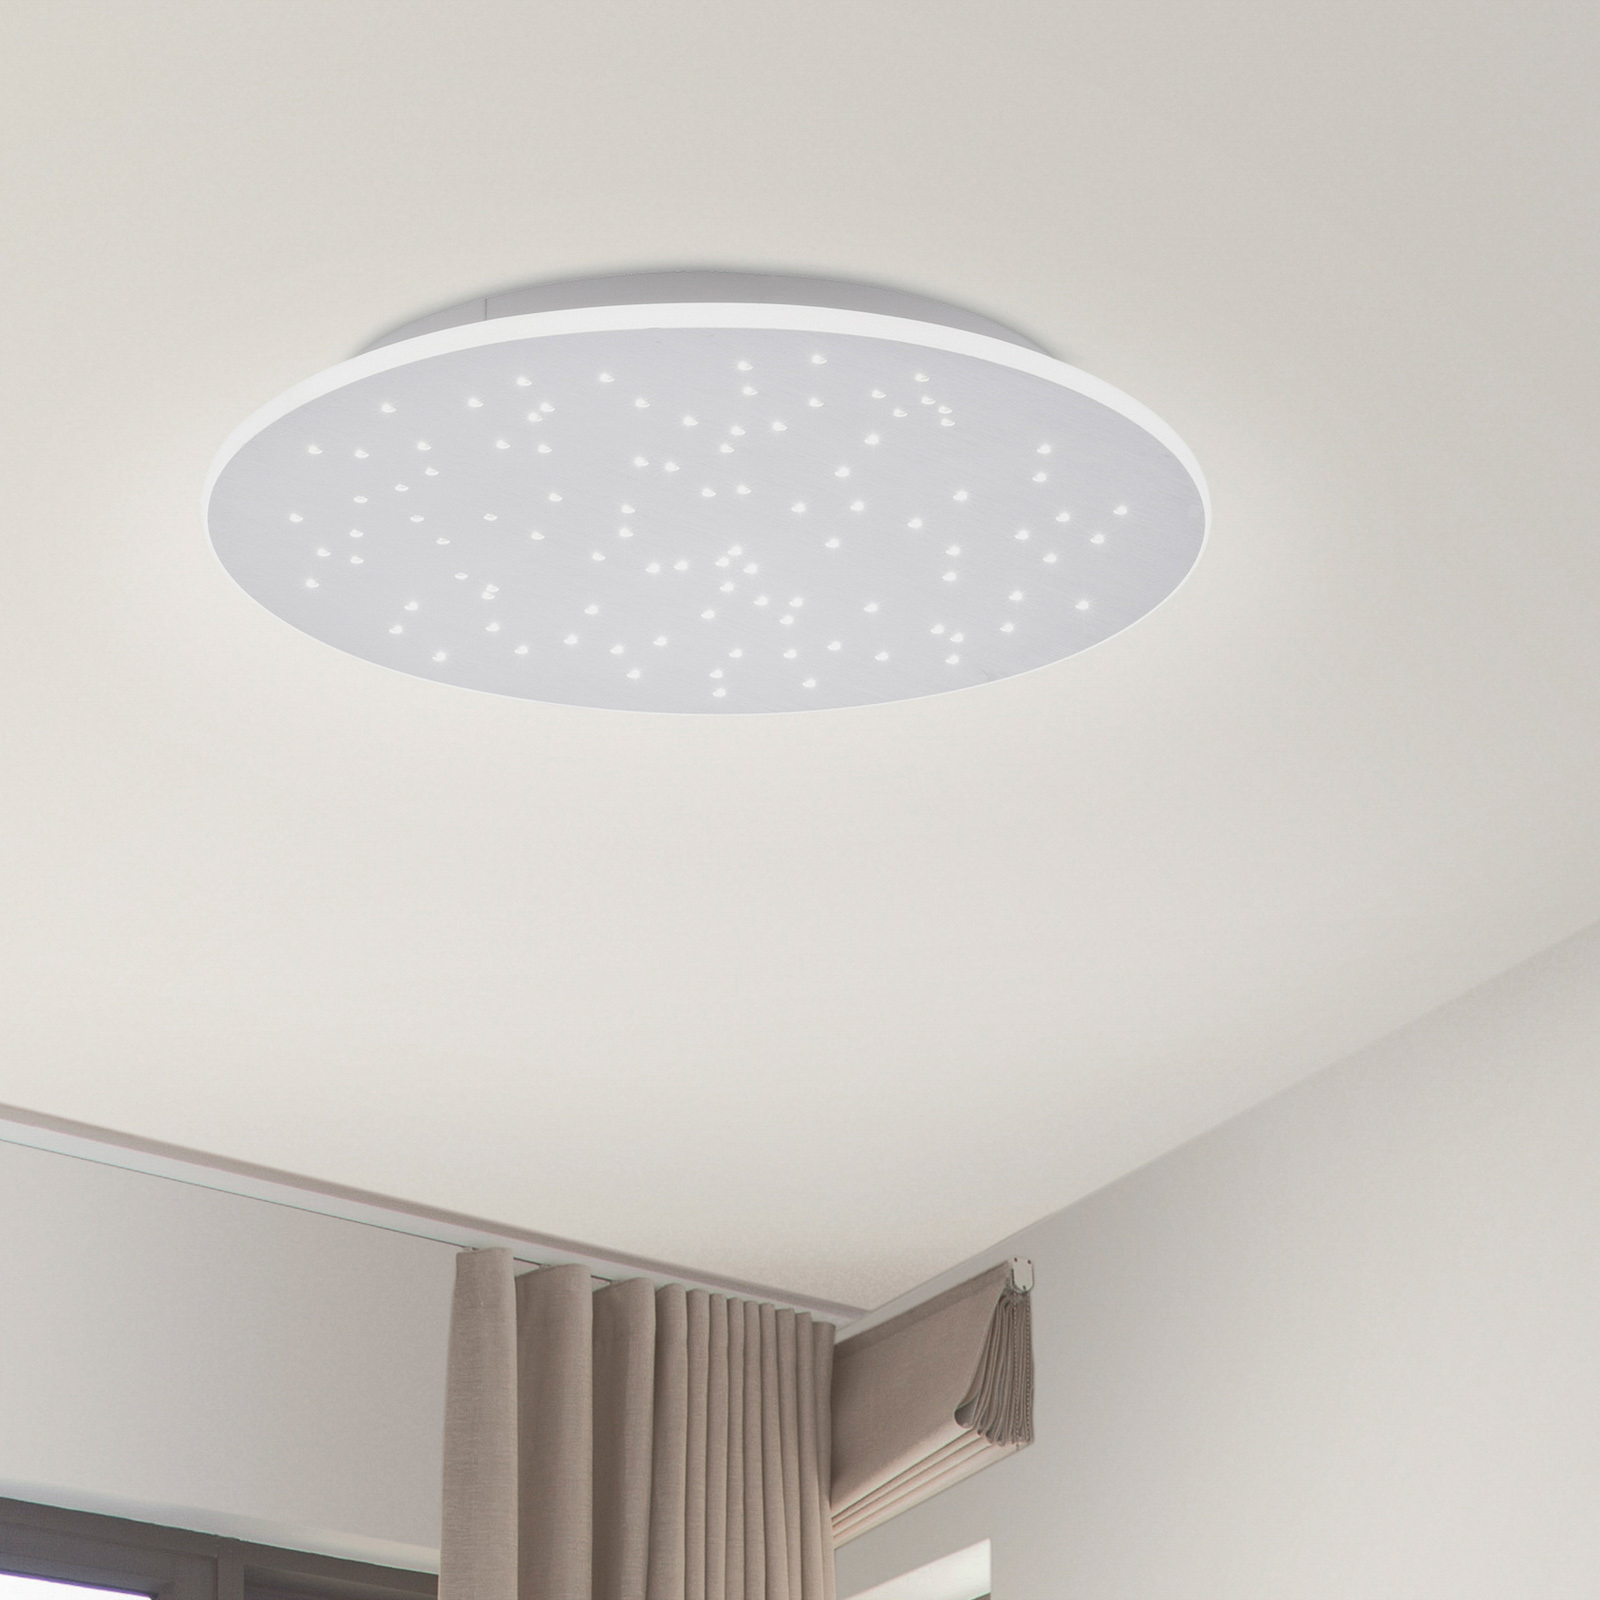 Paul Neuhaus Q-NIGHTSKY -LED-kattovalaisin, pyöreä